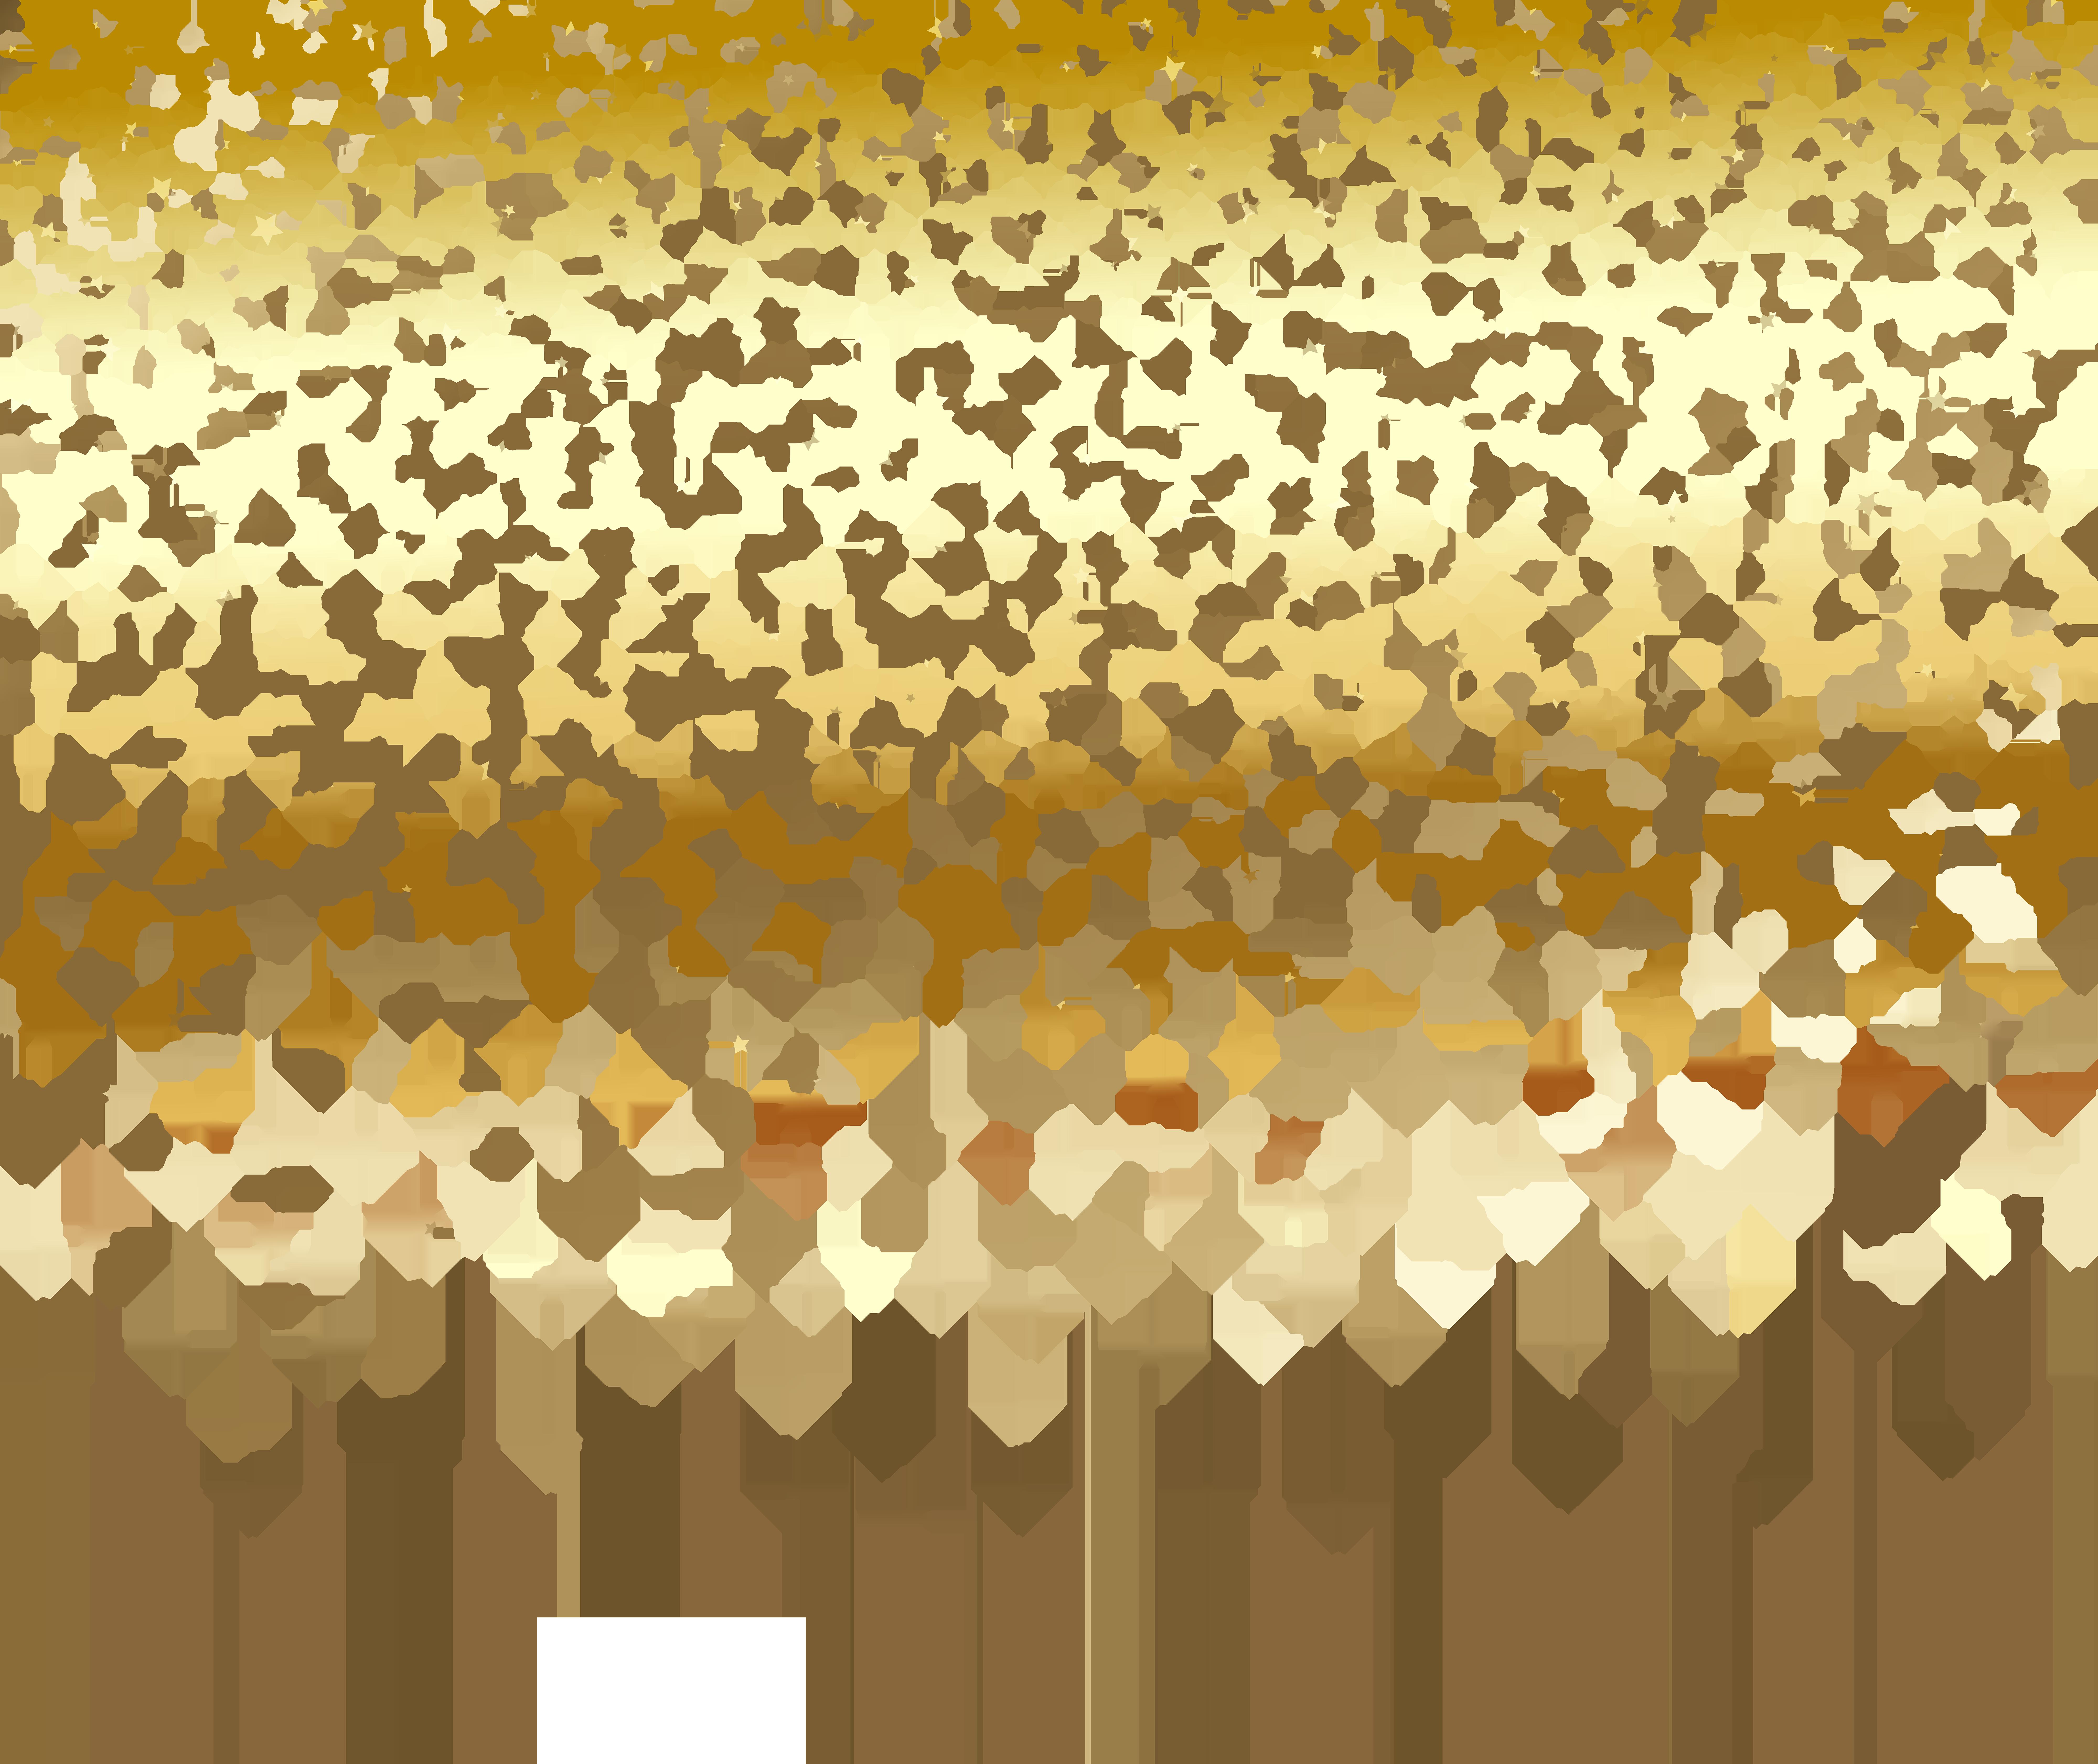 Decor transparent clip art. Stars png images